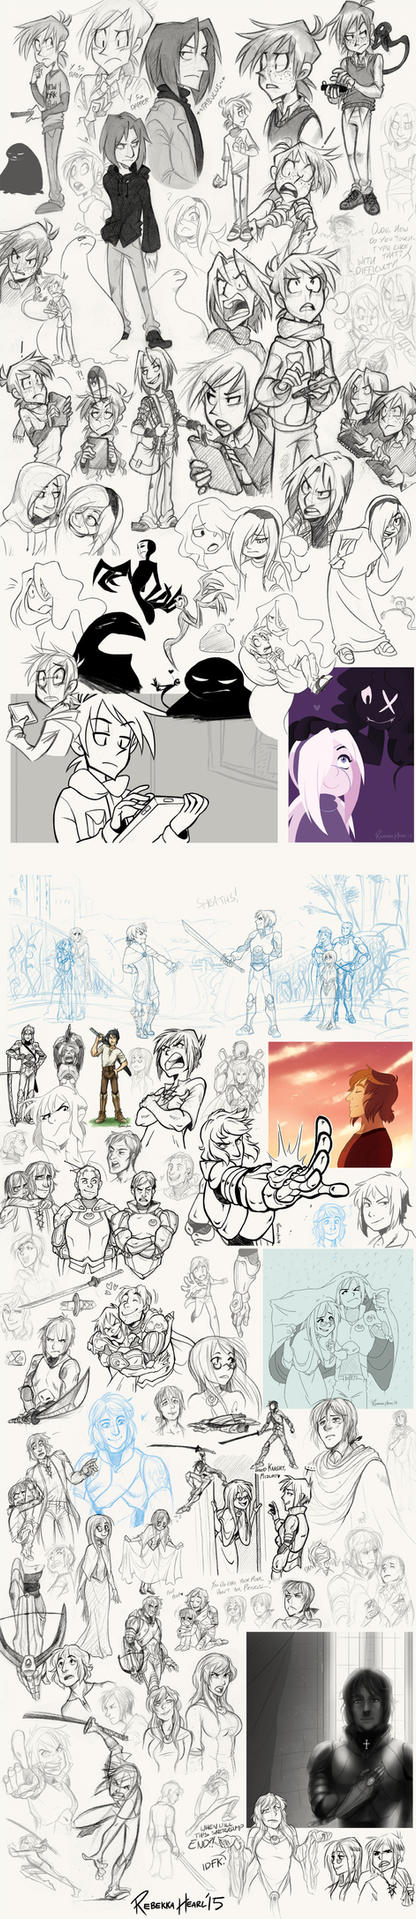 Monster Boy and Serai Sketchdump by ReincarnatedParano